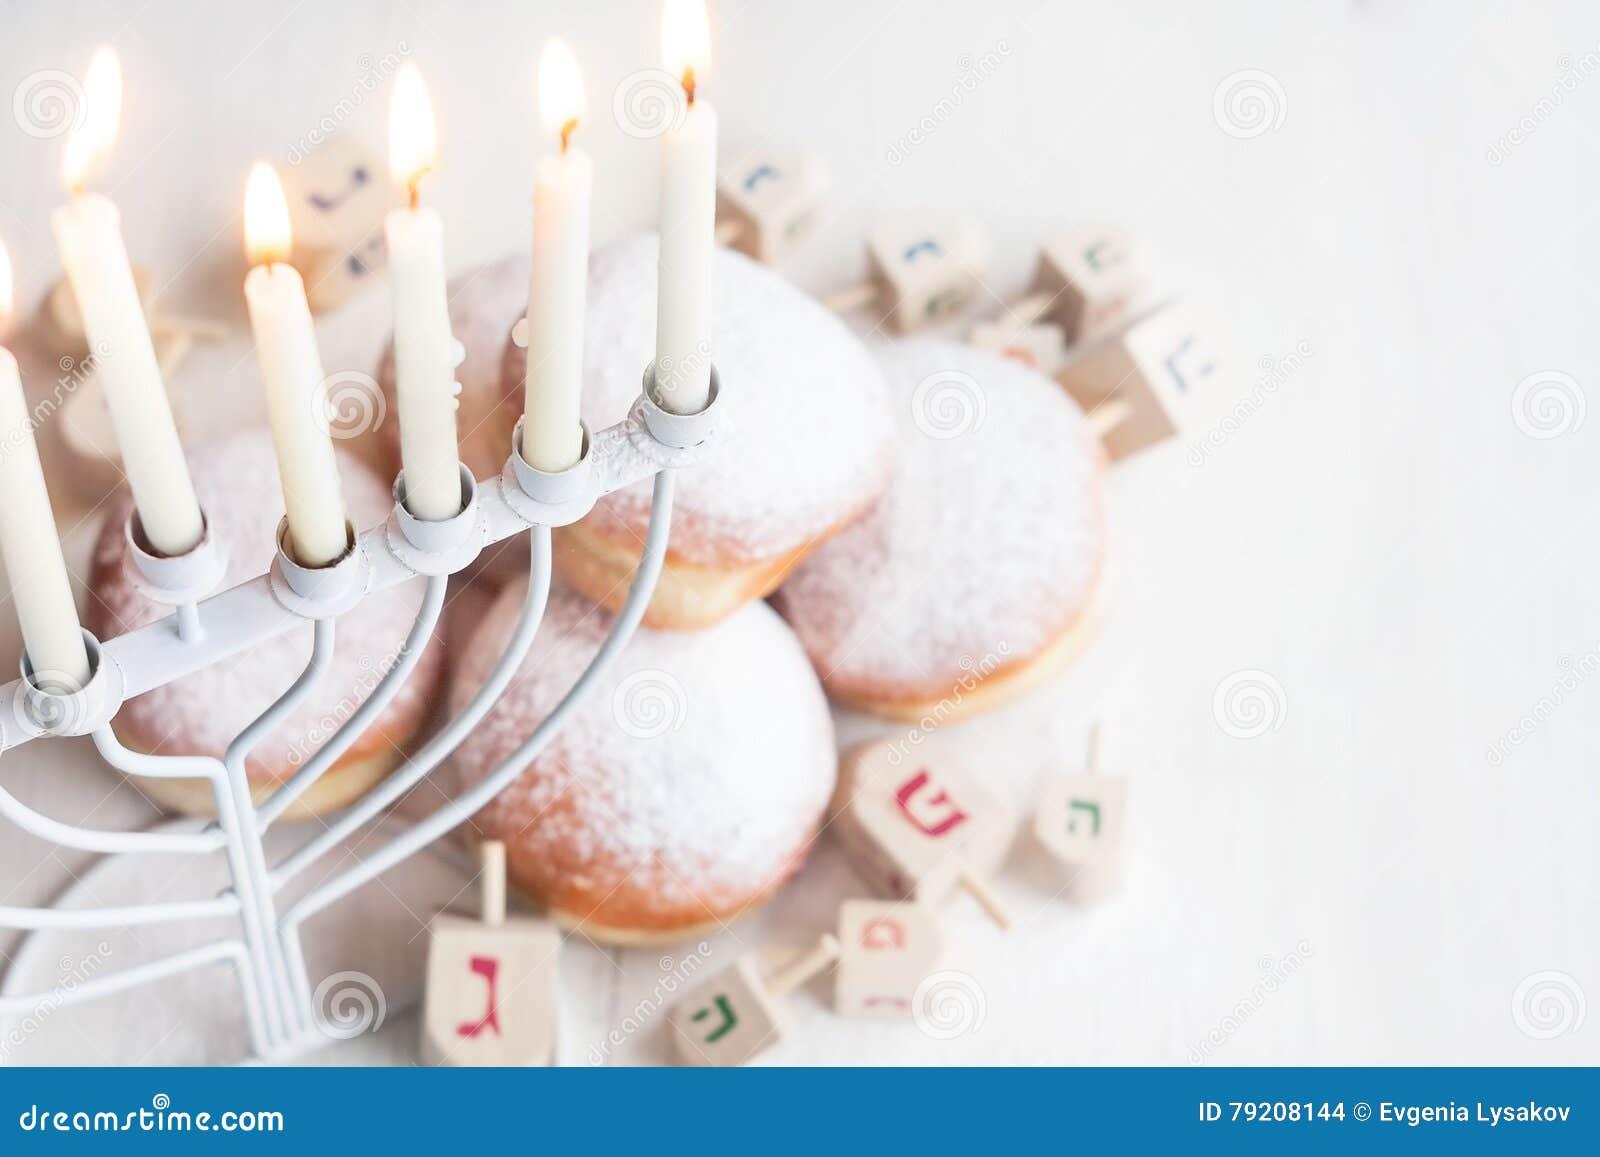 Jewish holiday Hannukah background